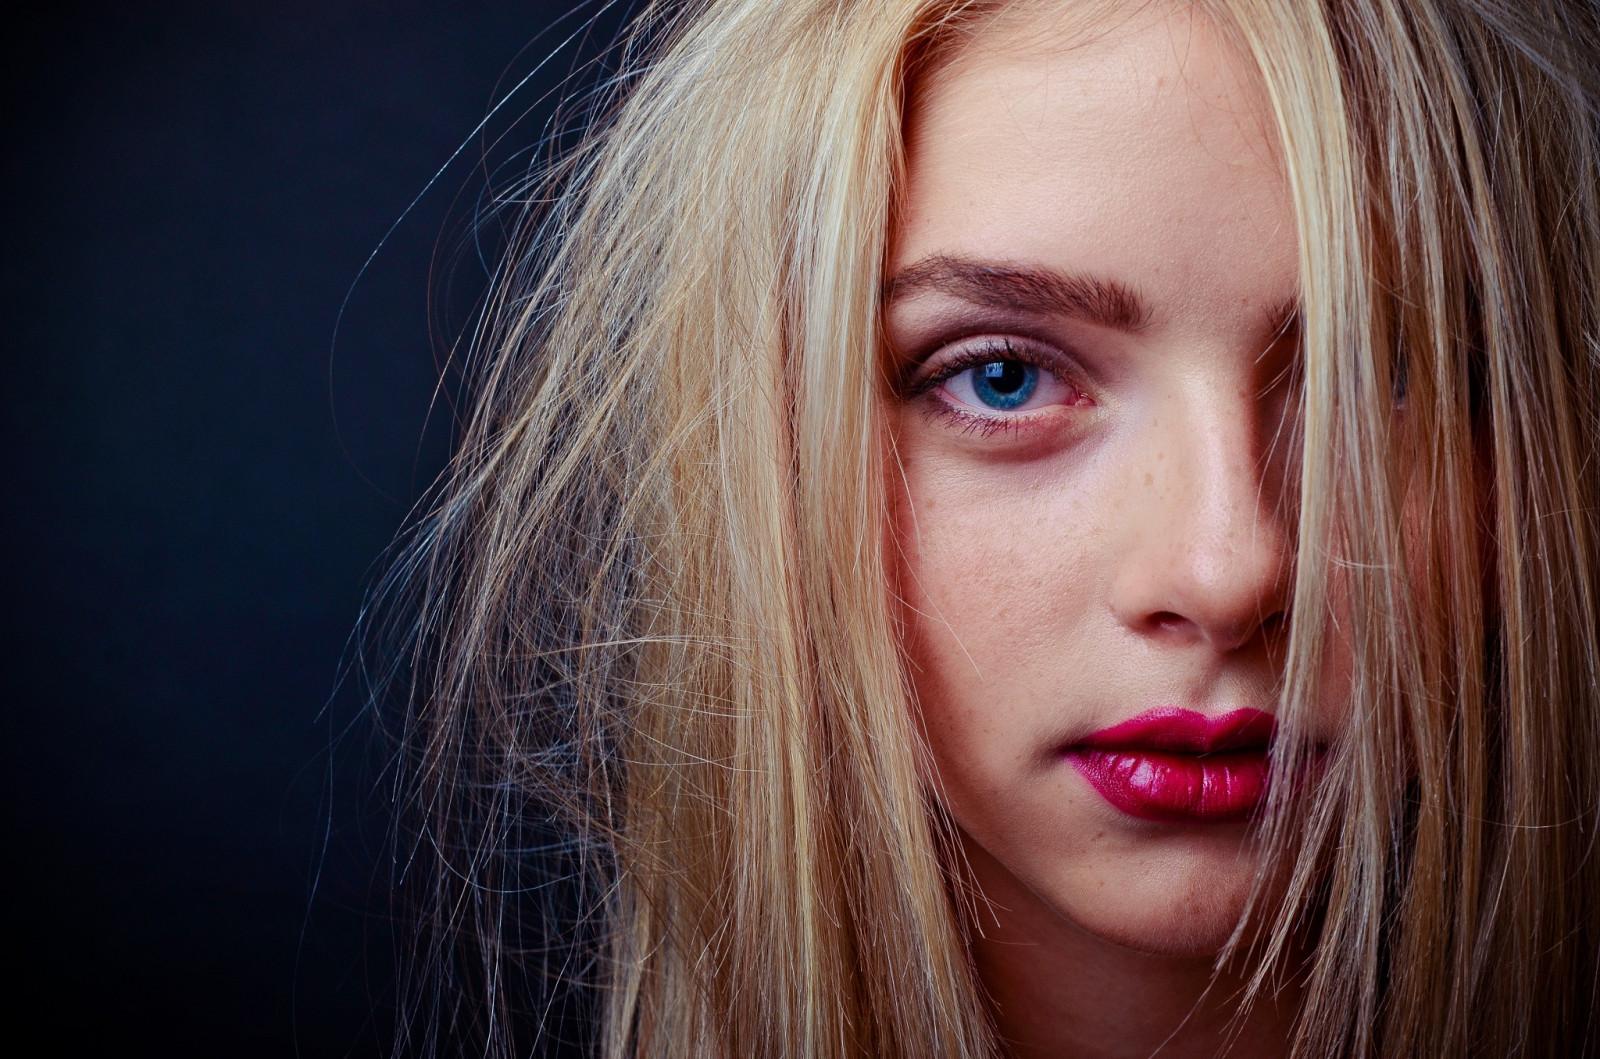 Red Lipstick Brown Hair Blue Eyes: Wallpaper : Face, Women, Model, Blonde, Simple Background